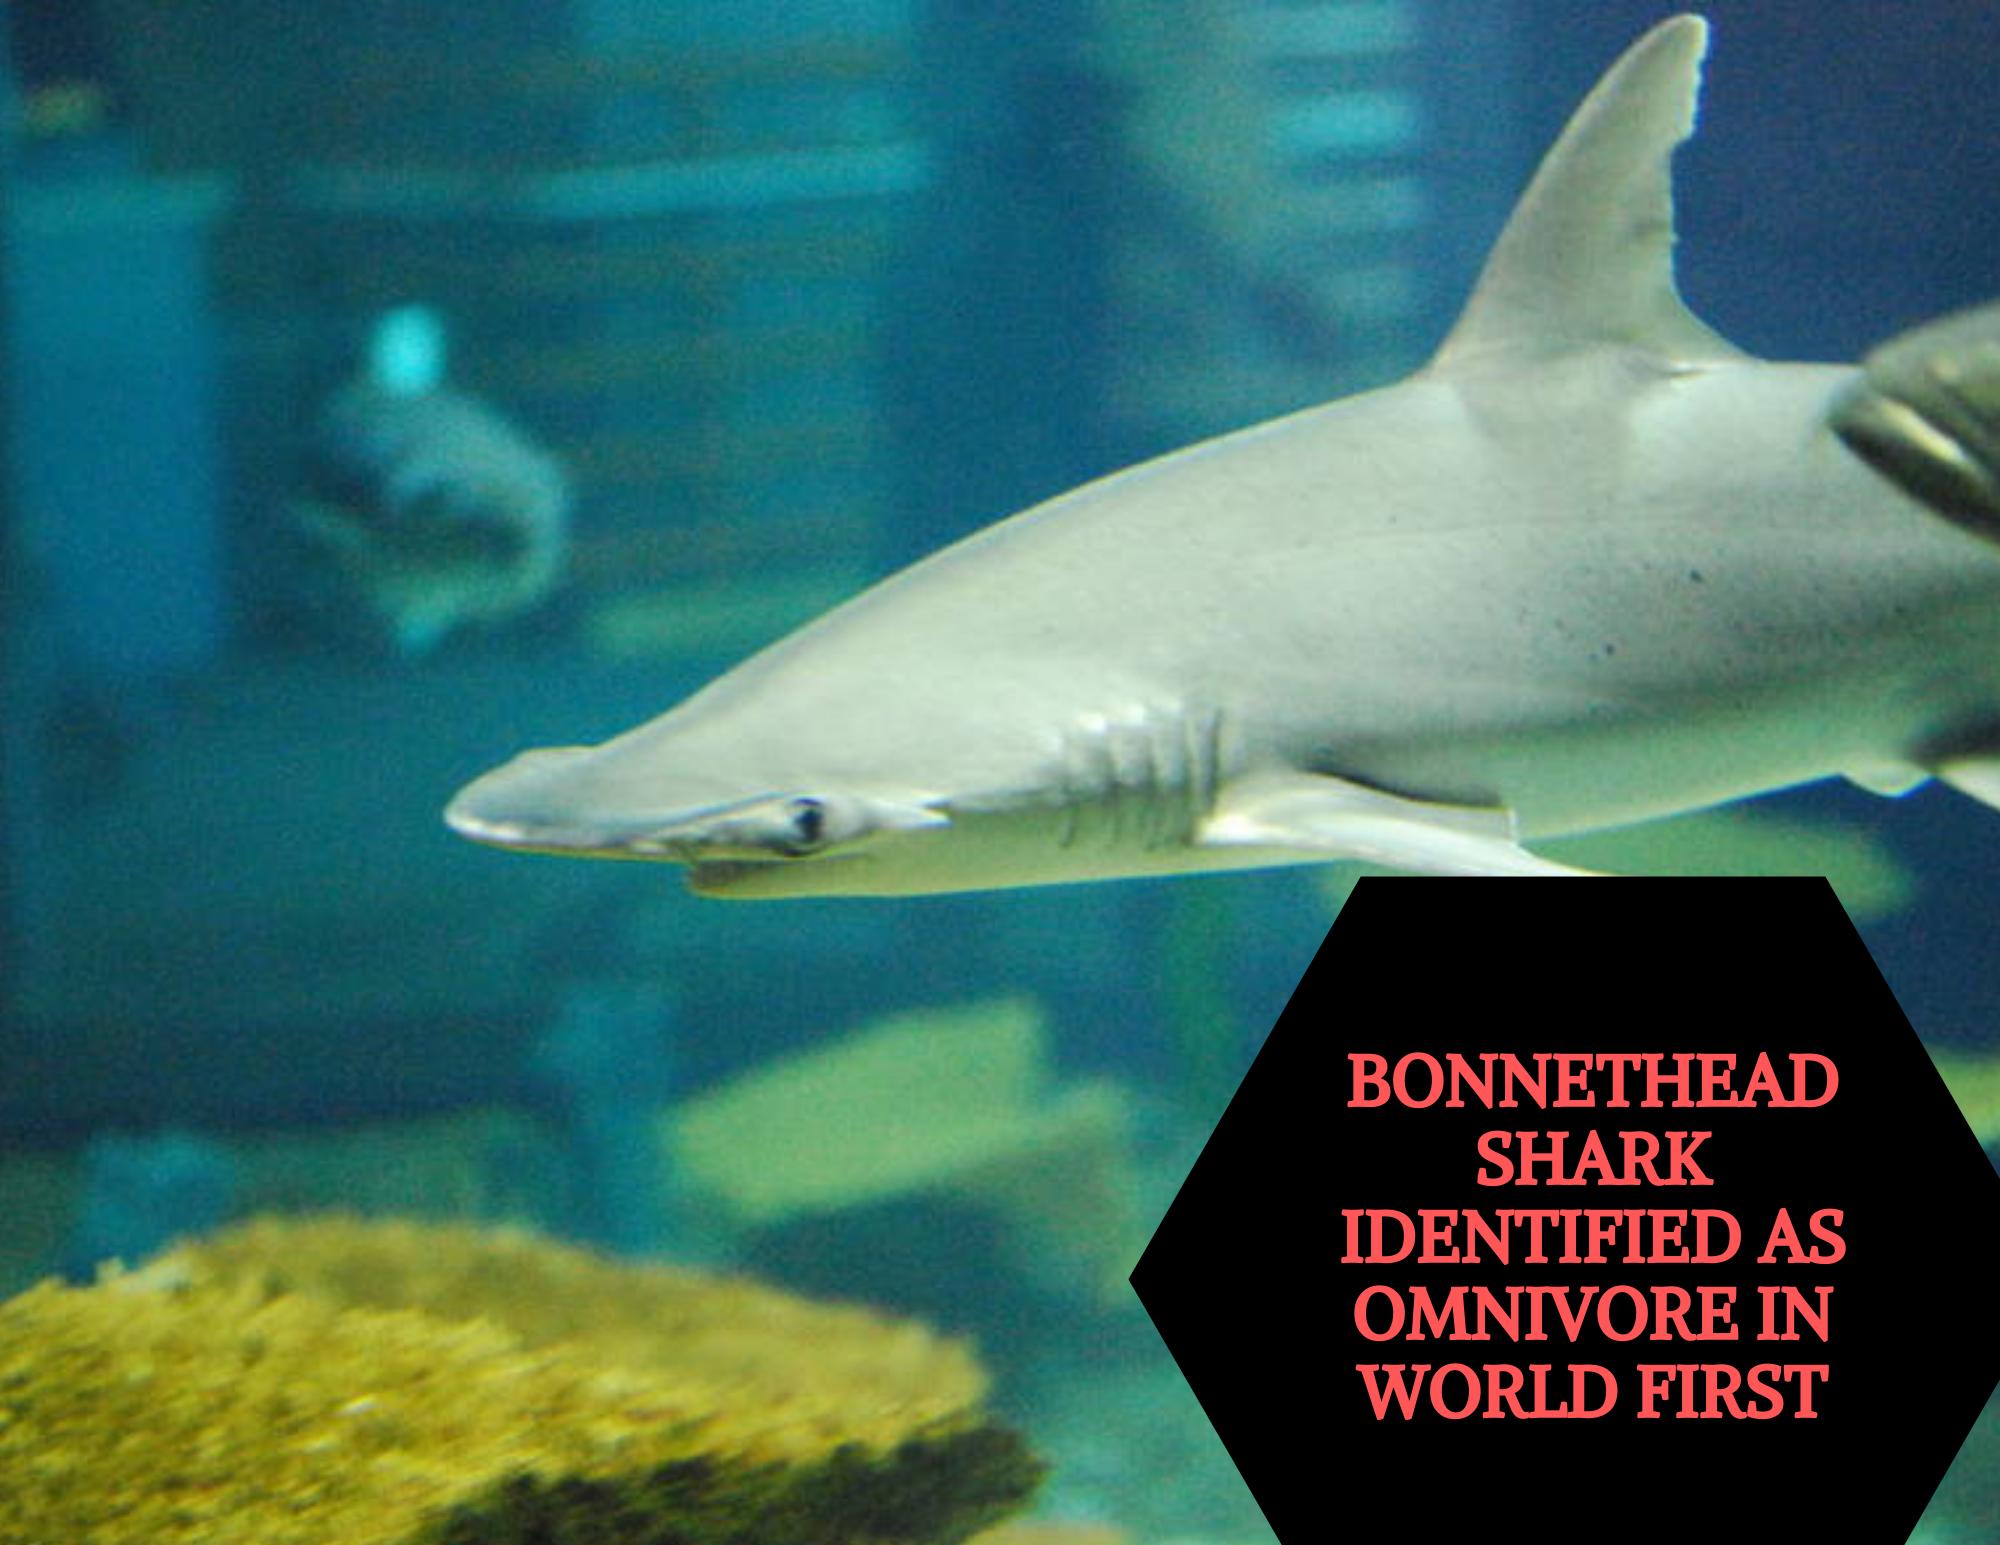 The Revelation That The Bonnethead Shark Is An Omnivore